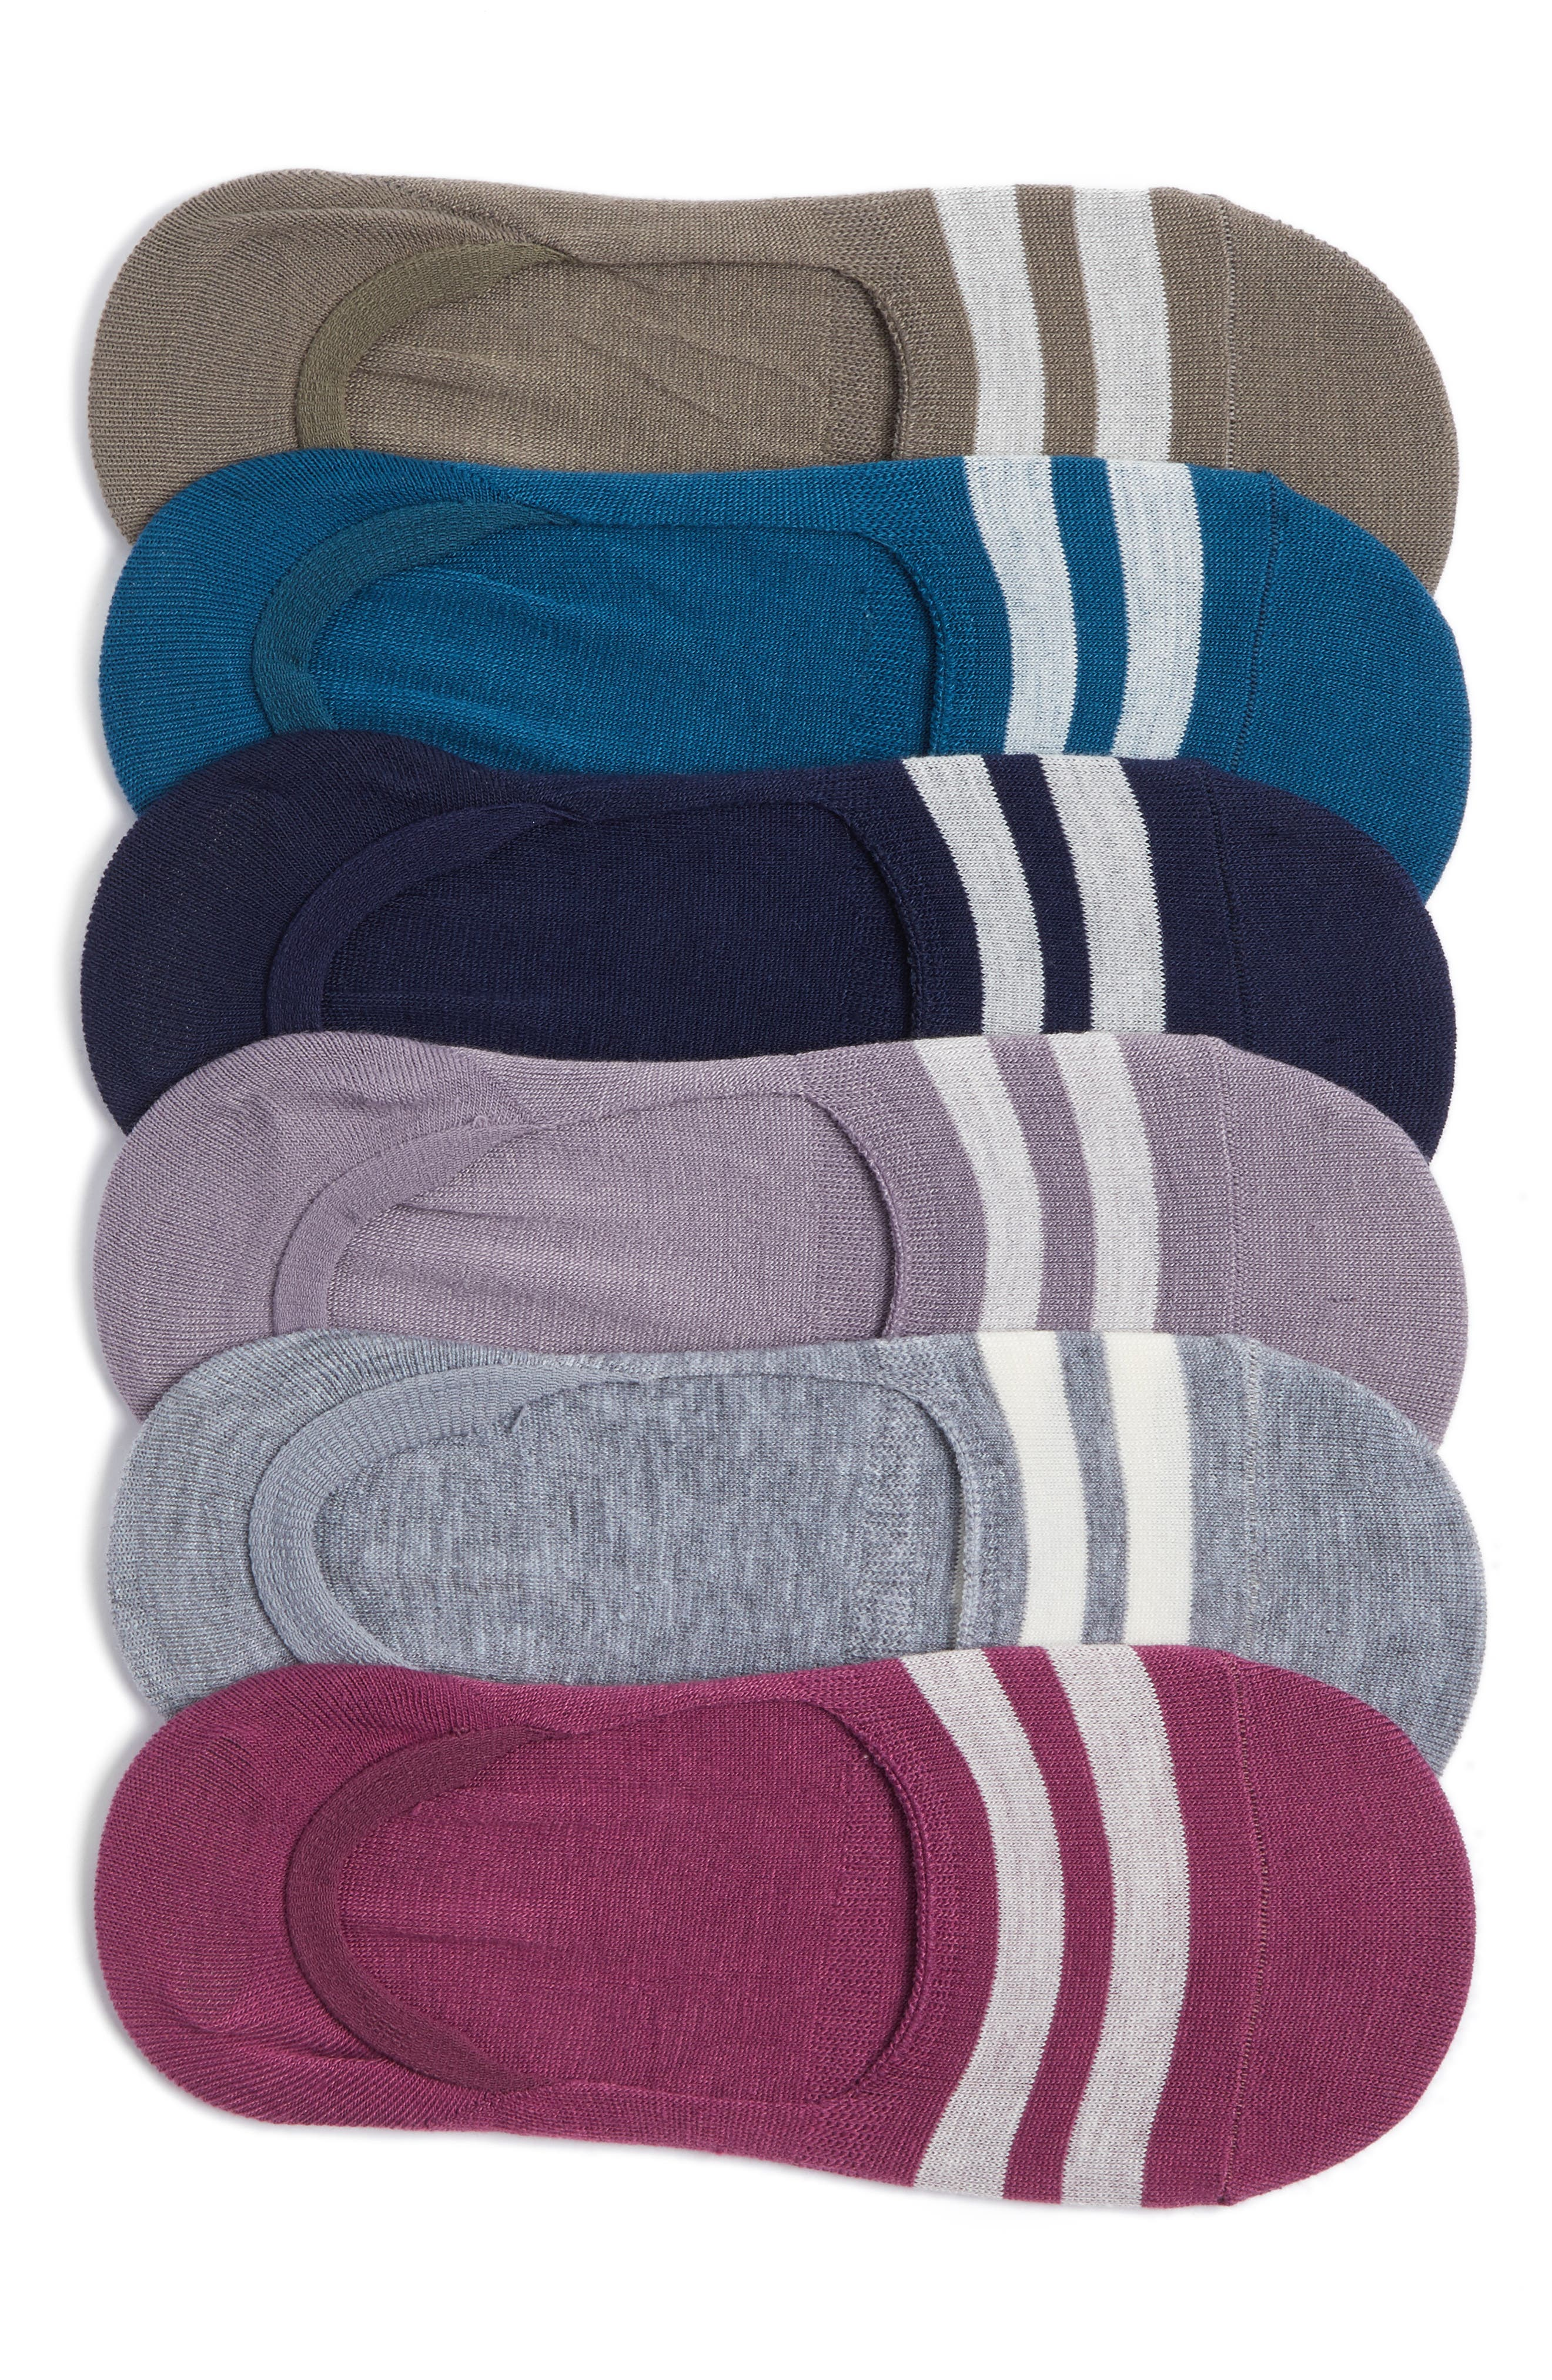 Main Image - Sof Sole Varsity Stripe No-Show Socks